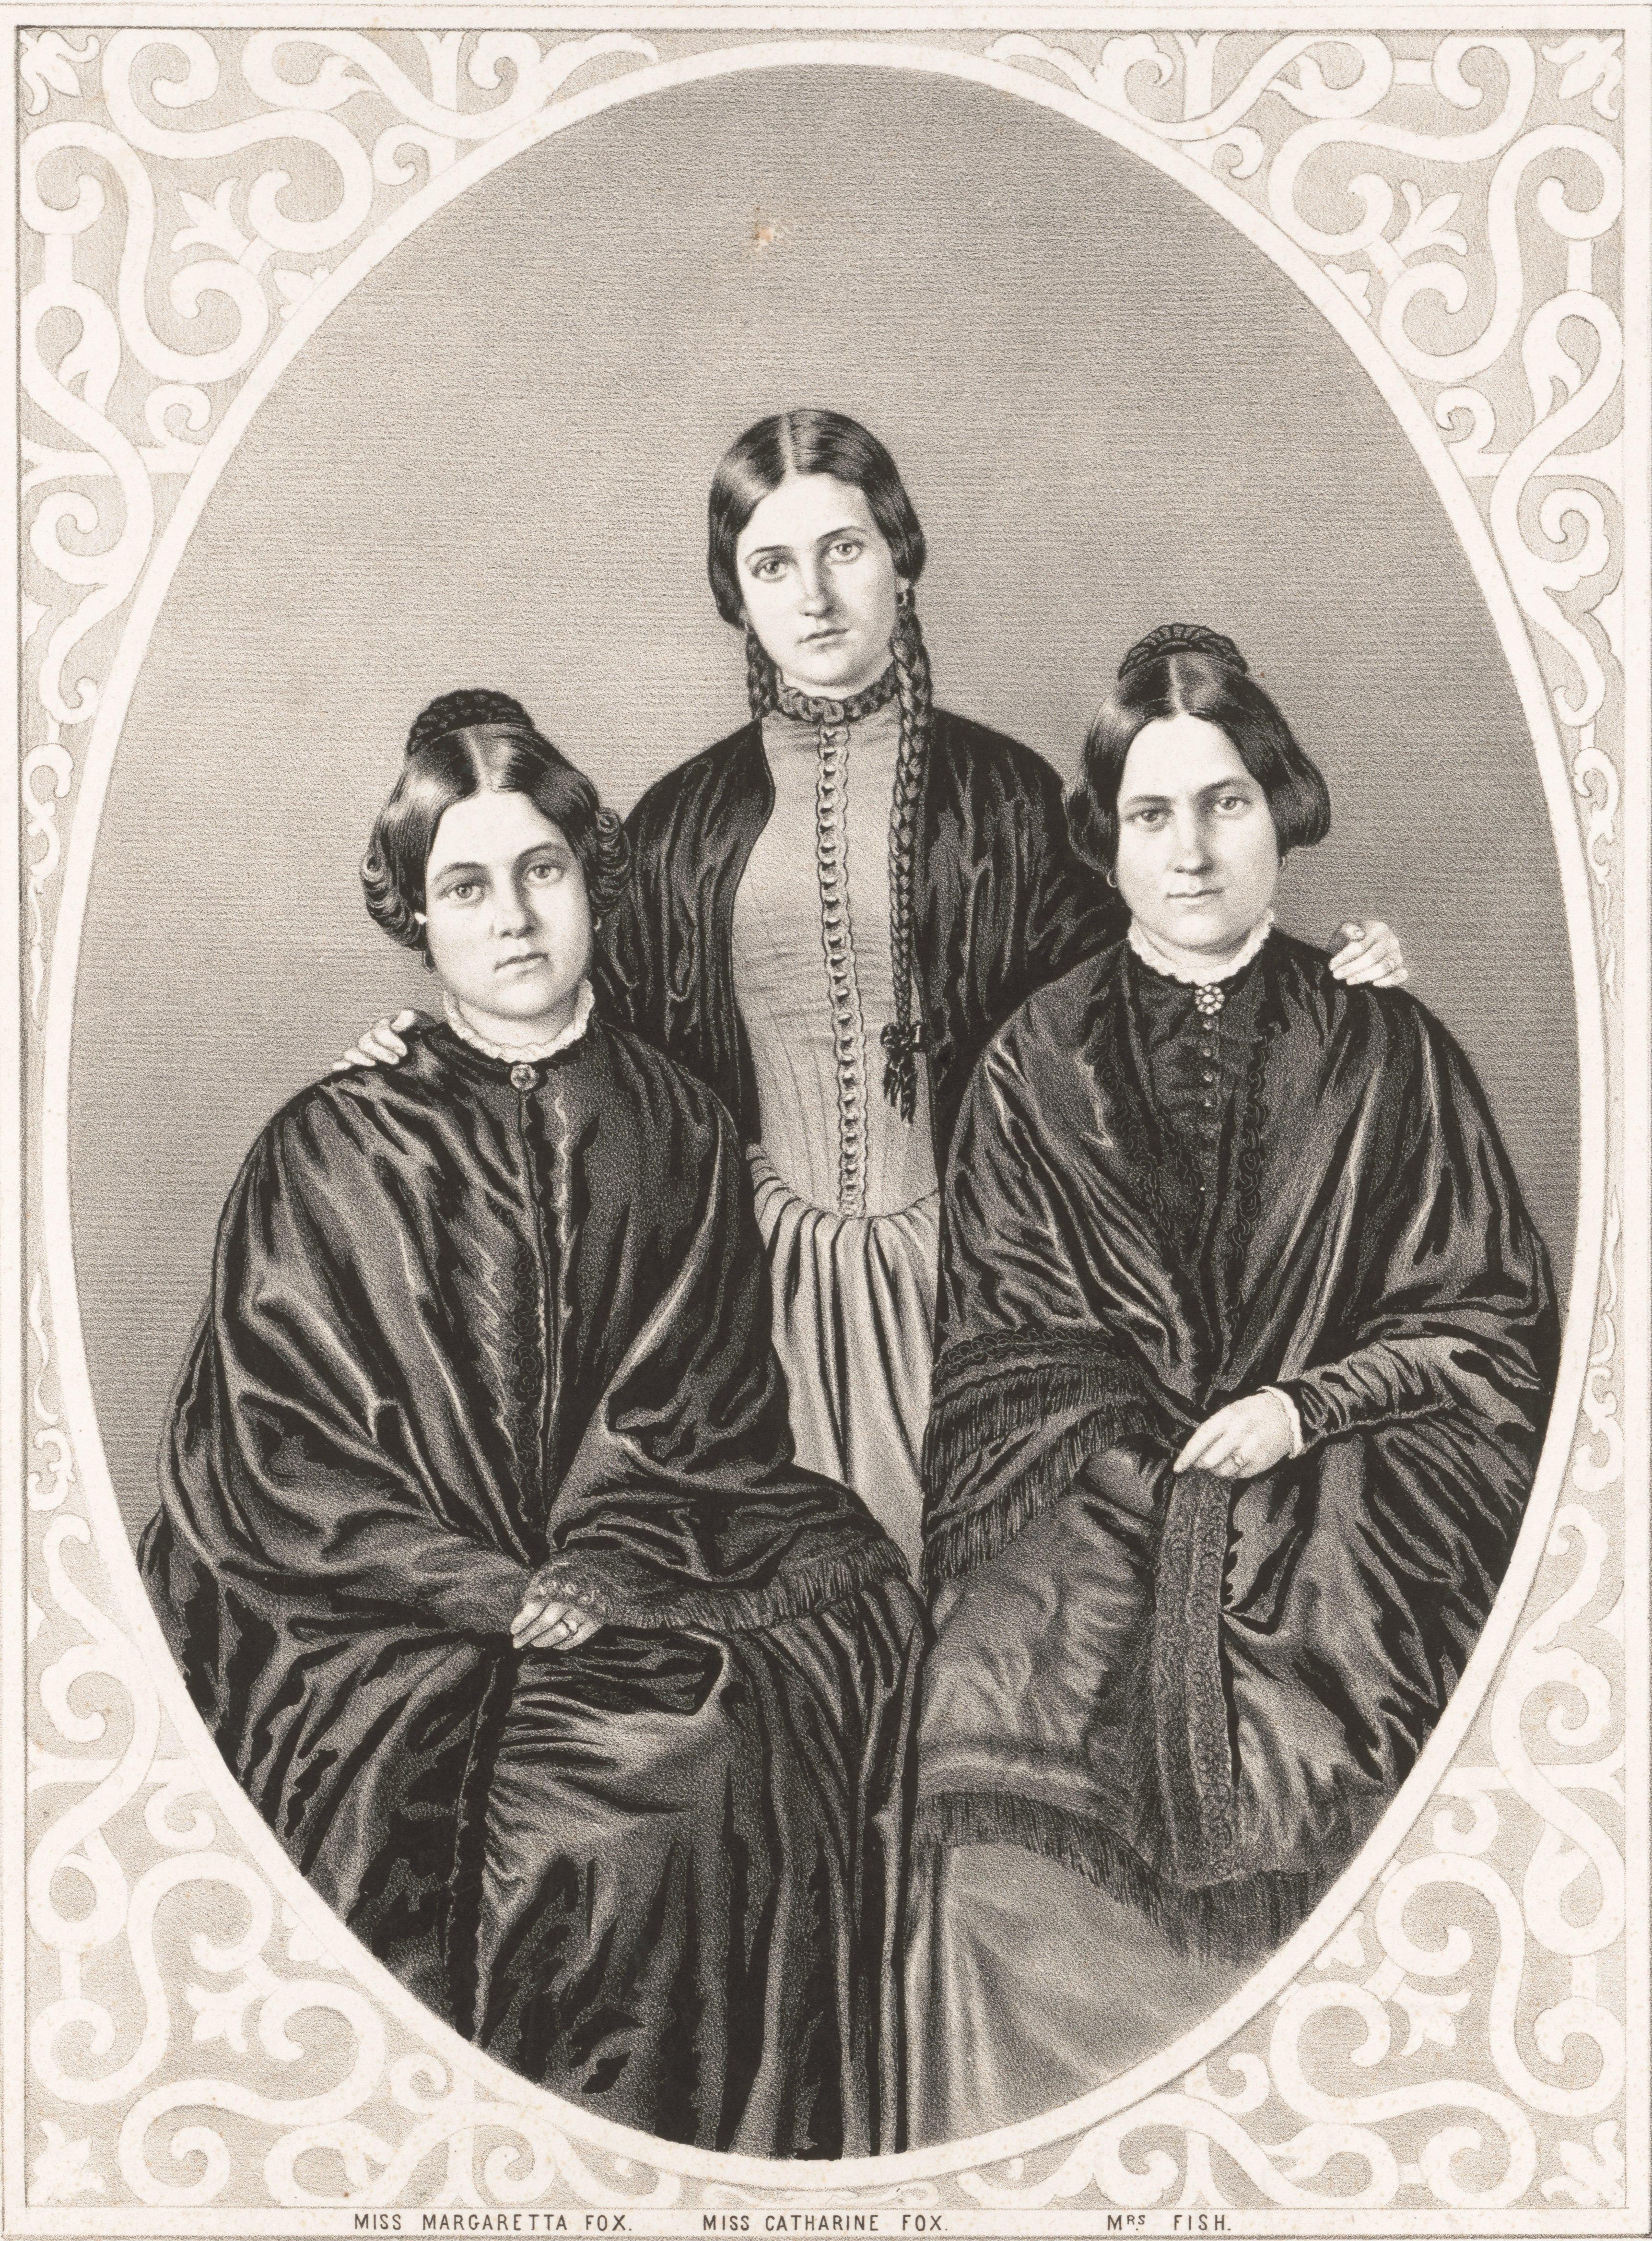 Fox sisters - Wikipedia